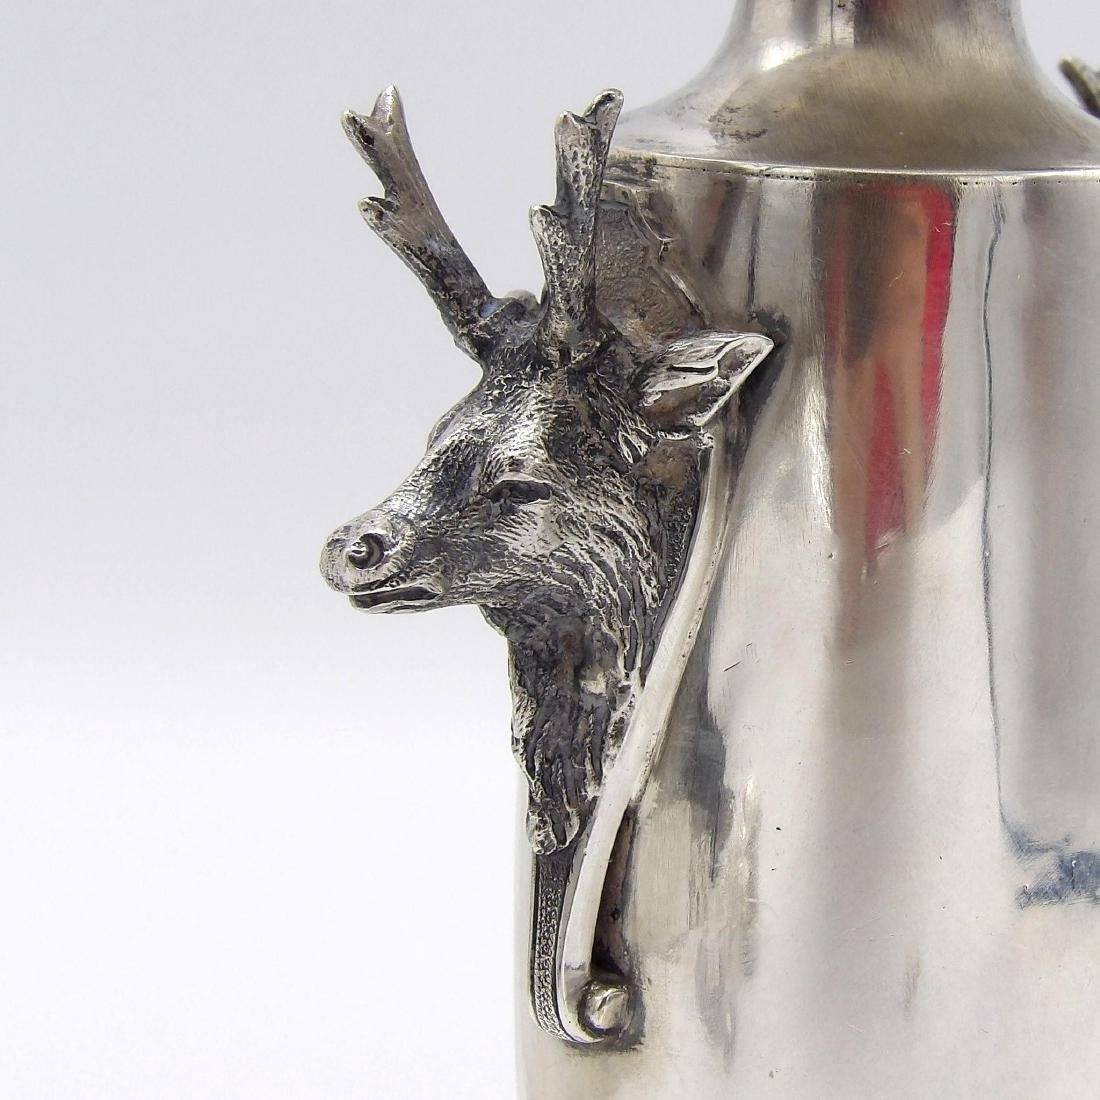 Antique Gorham Saxon Stag Sterling Silver Bud Vase 1860 - 7